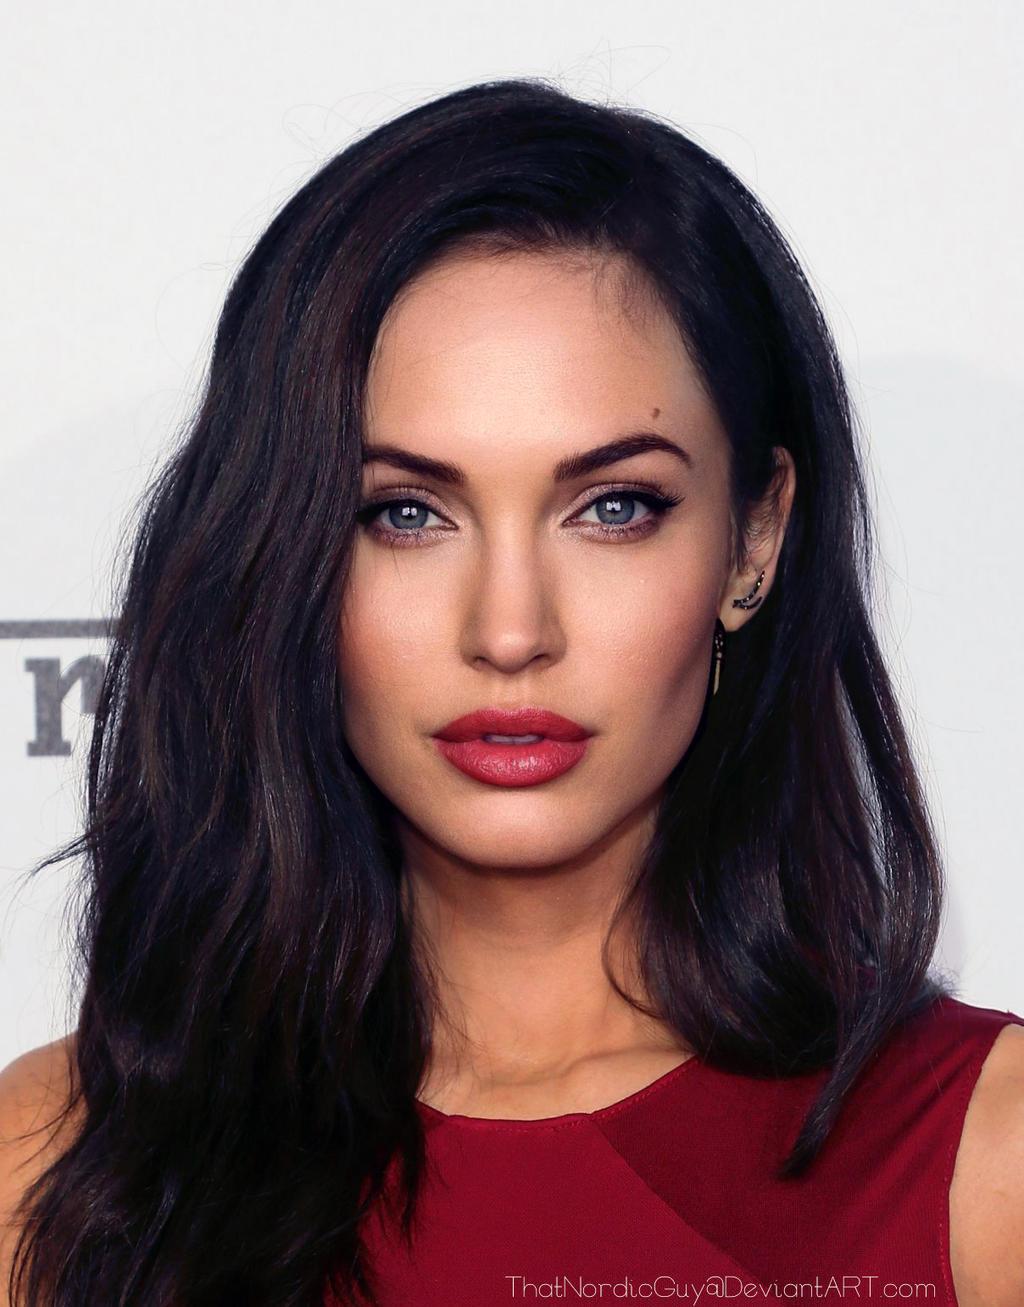 Megan Fox / Angelina Jolie